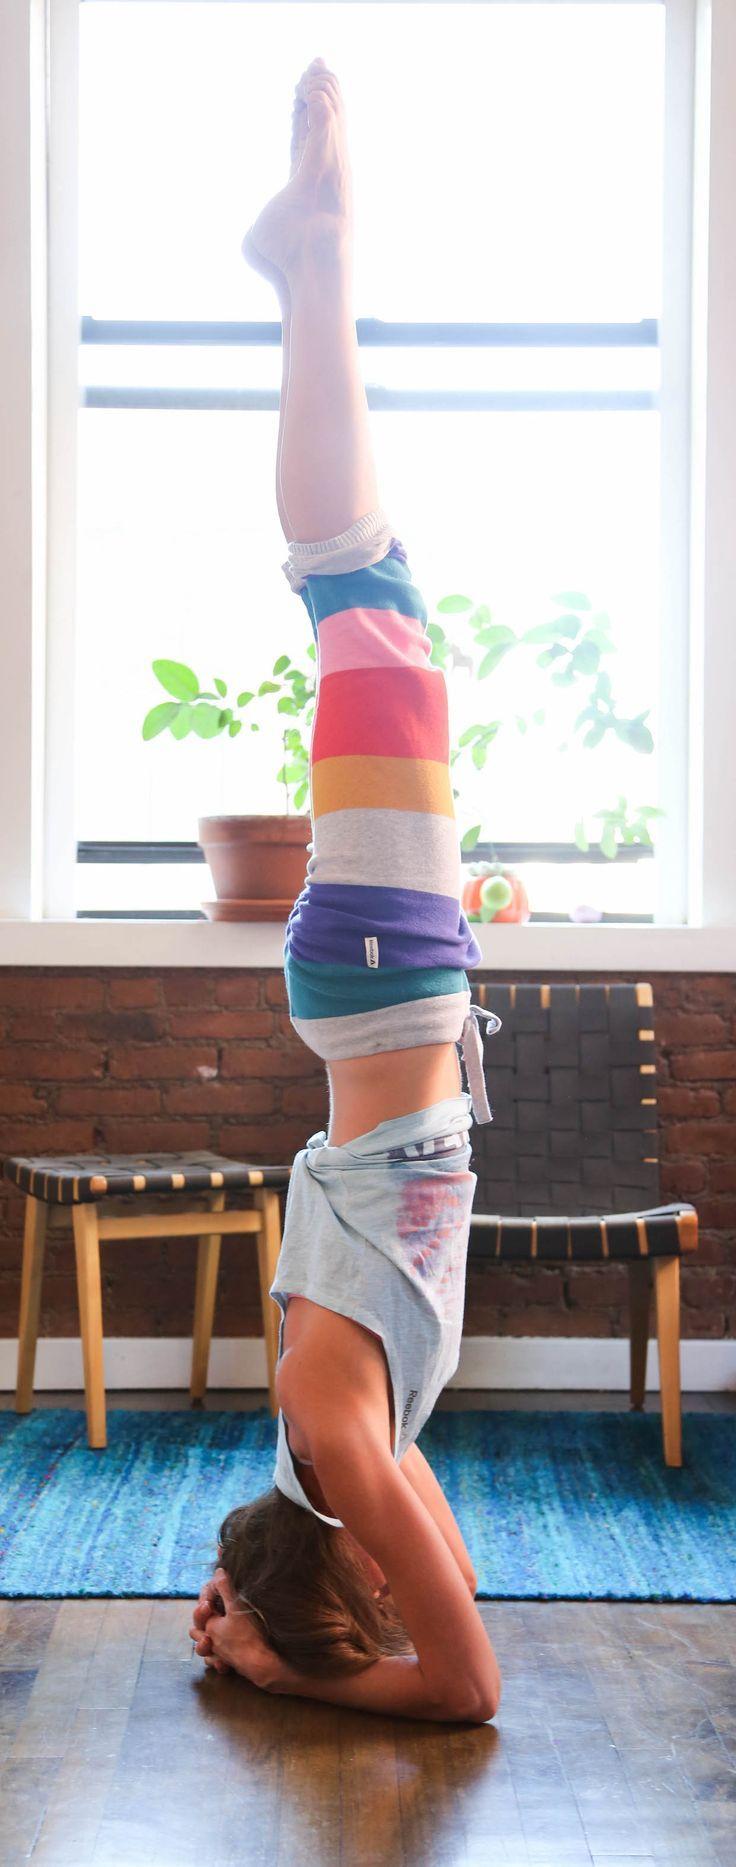 Yogi Tara Stiles Moisturizes By The Bucketloads: And Says Coffee Isn't So Ba...